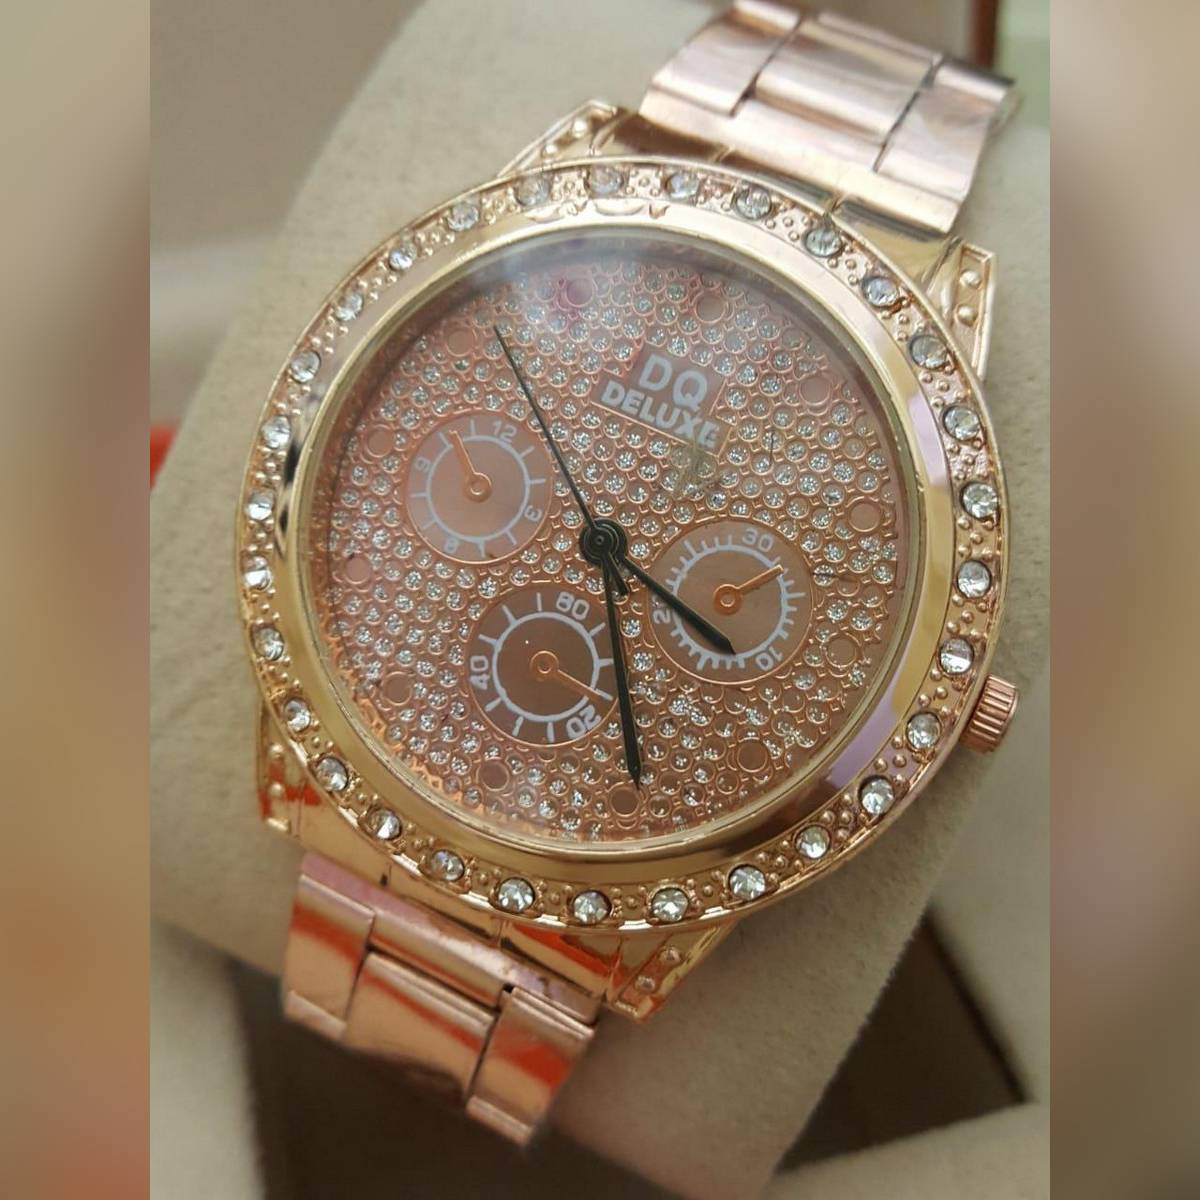 Stainless Steel Stylish Diamond Watch for Girls